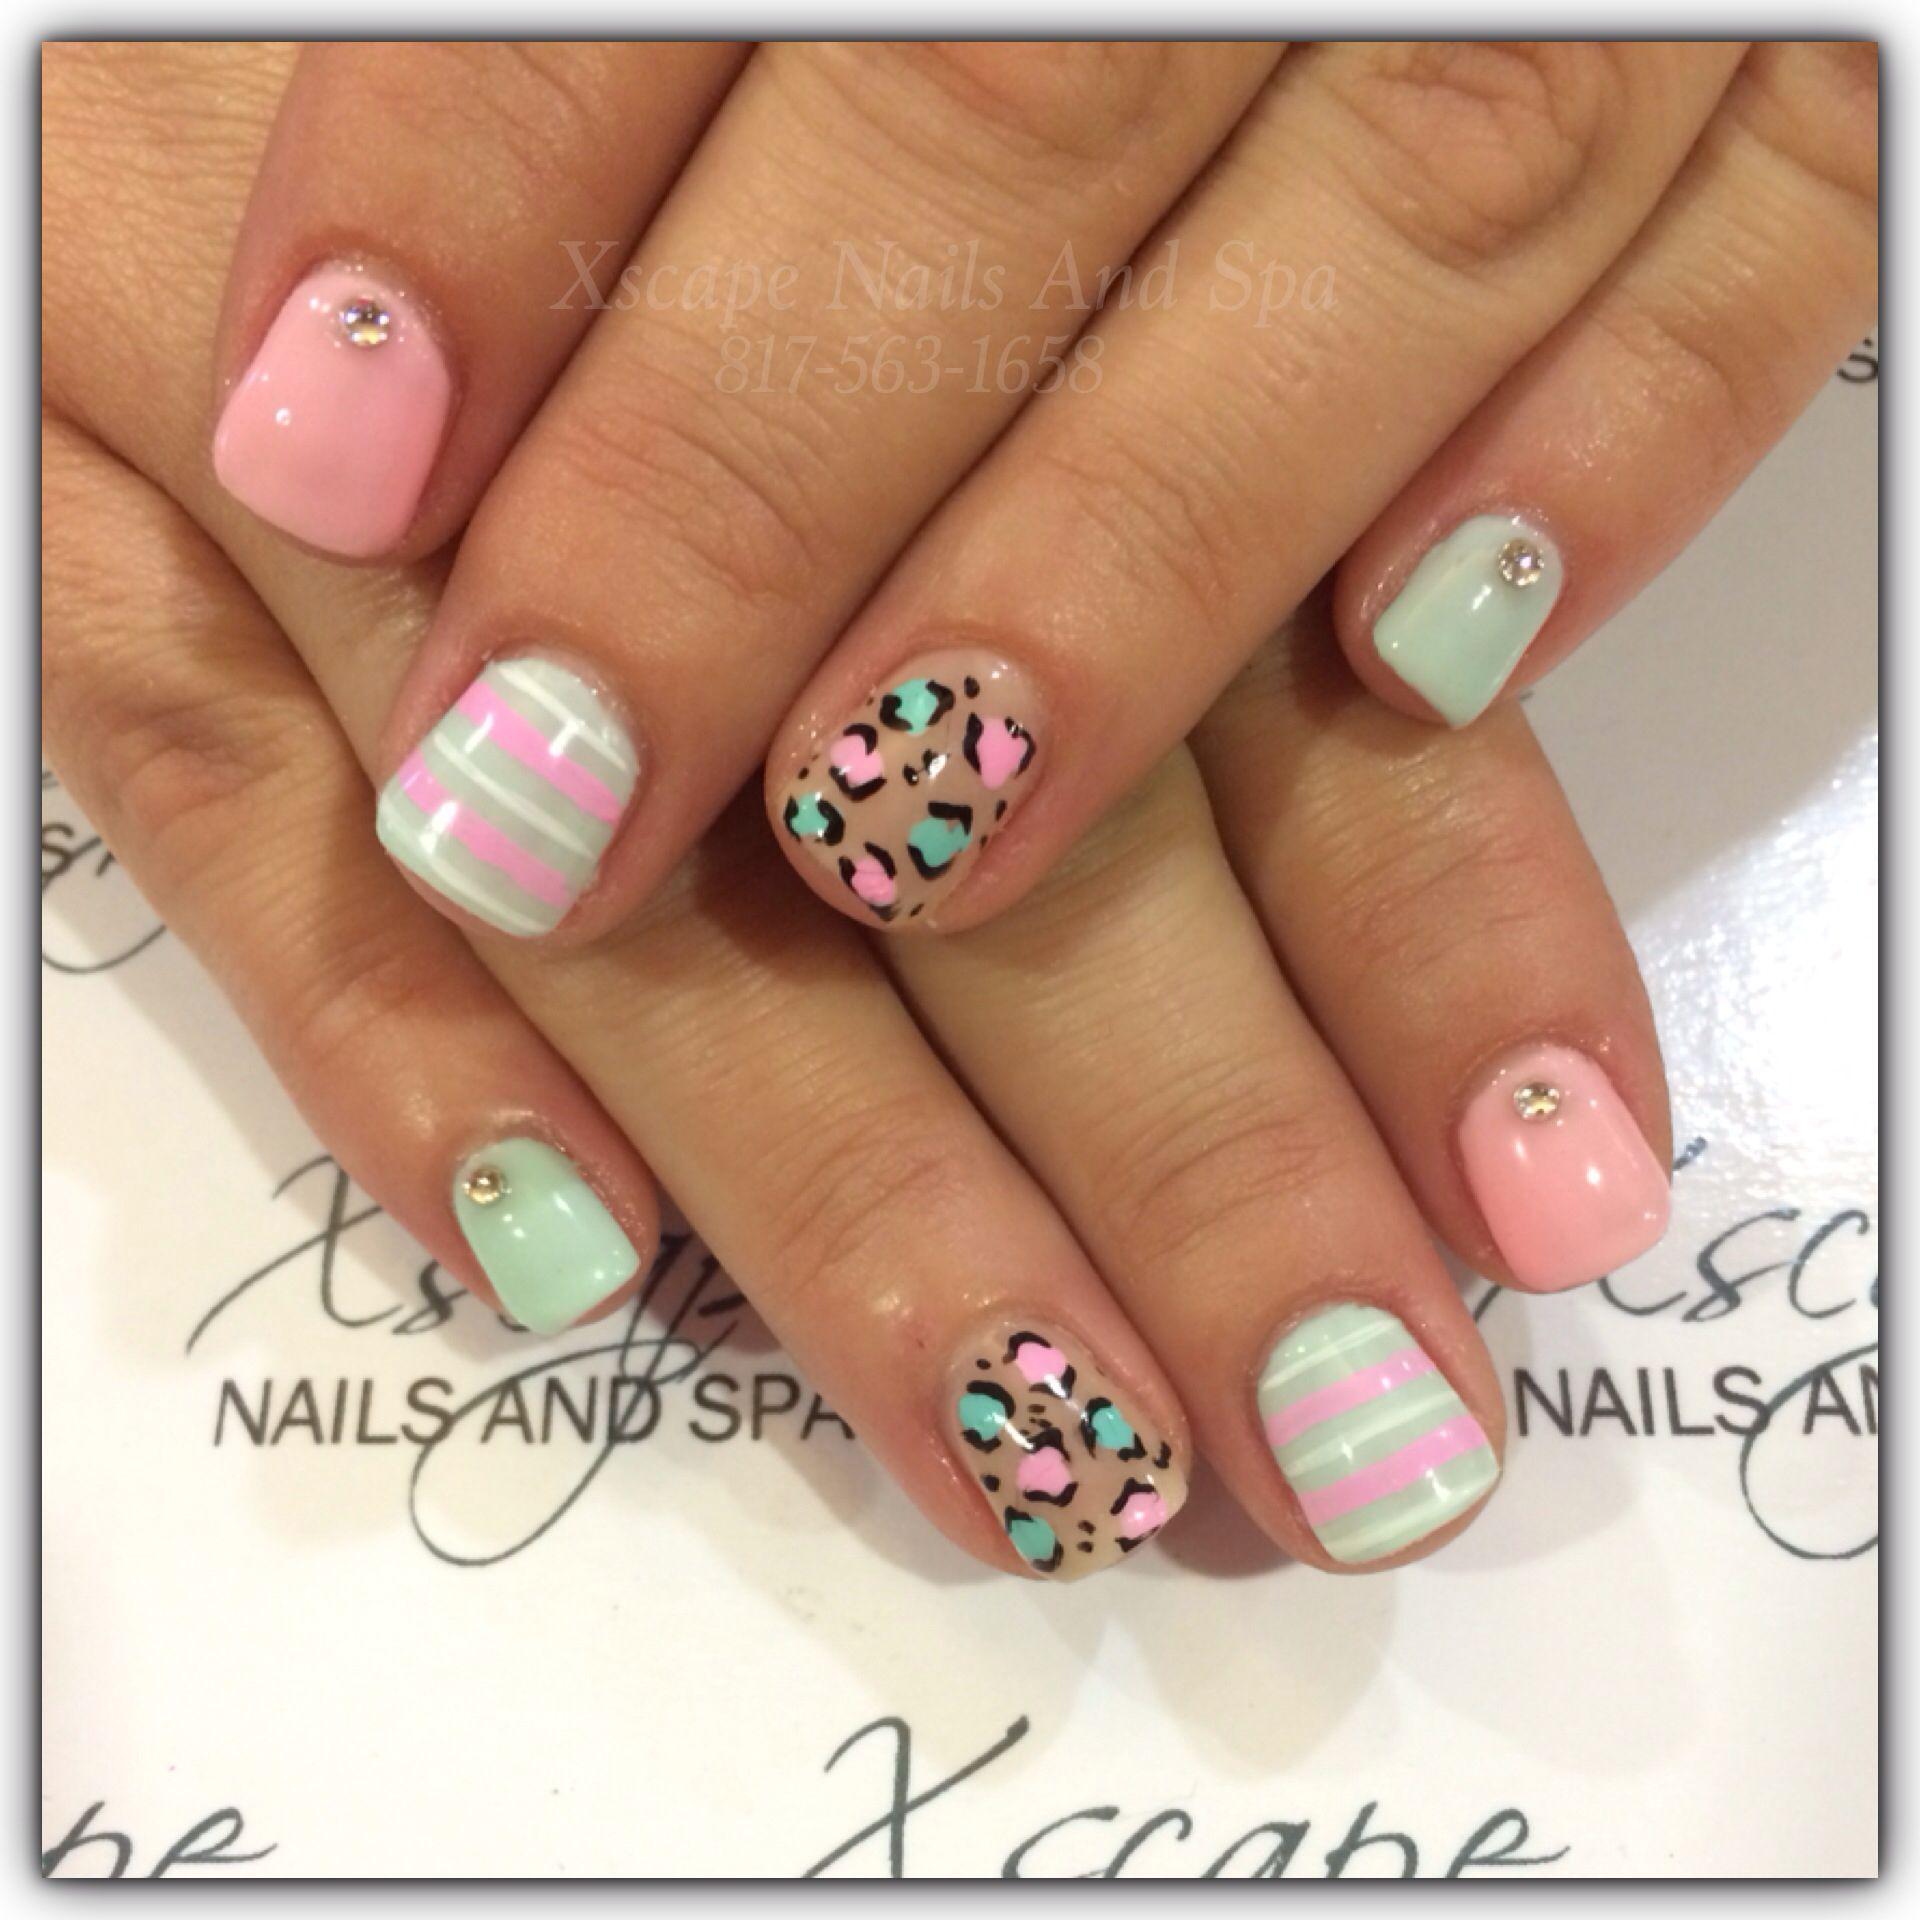 Gel nails | Cute Nails Designs | Pinterest